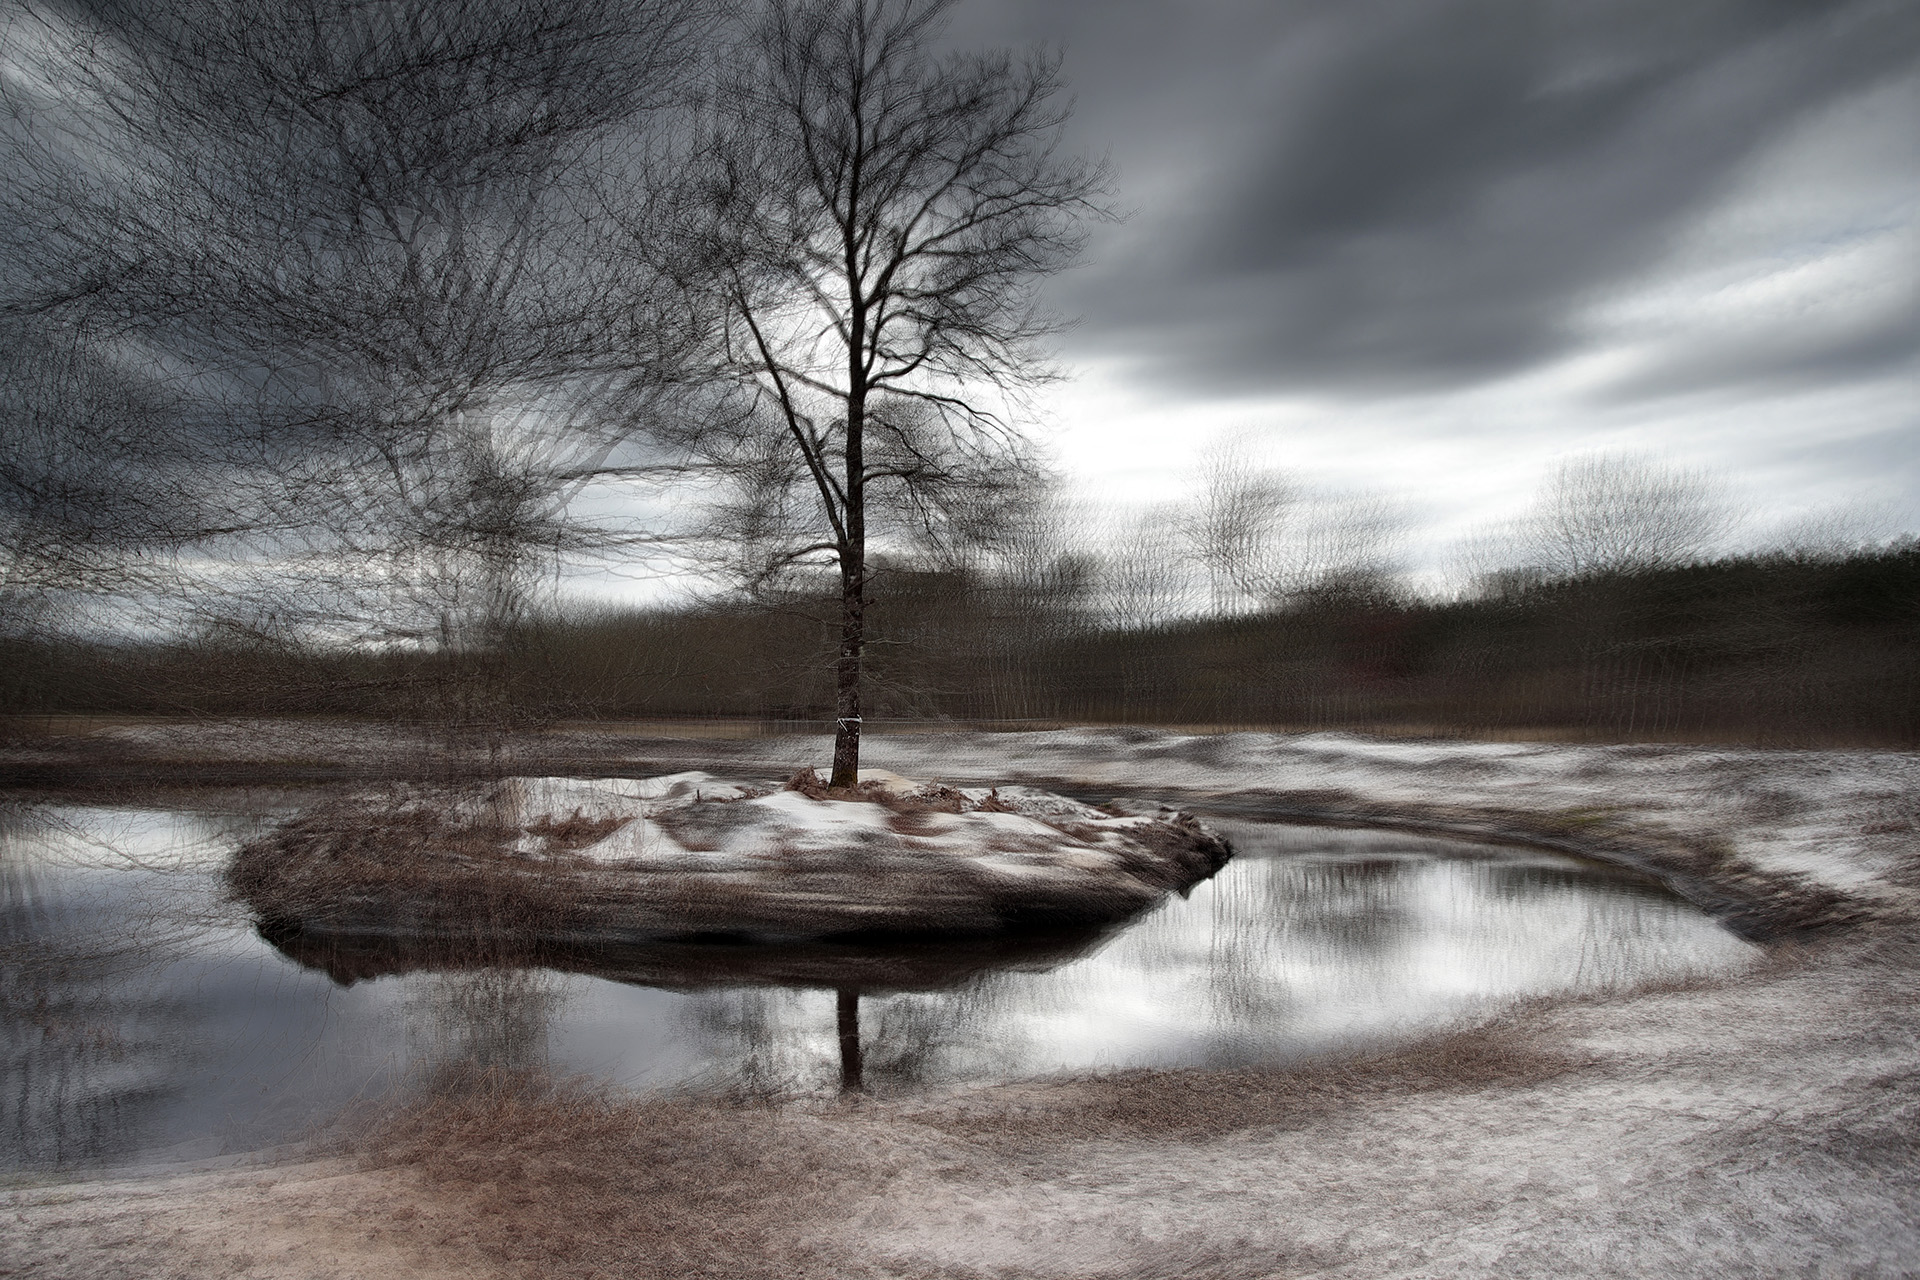 GRAILLOT Hervé - Juste un arbre